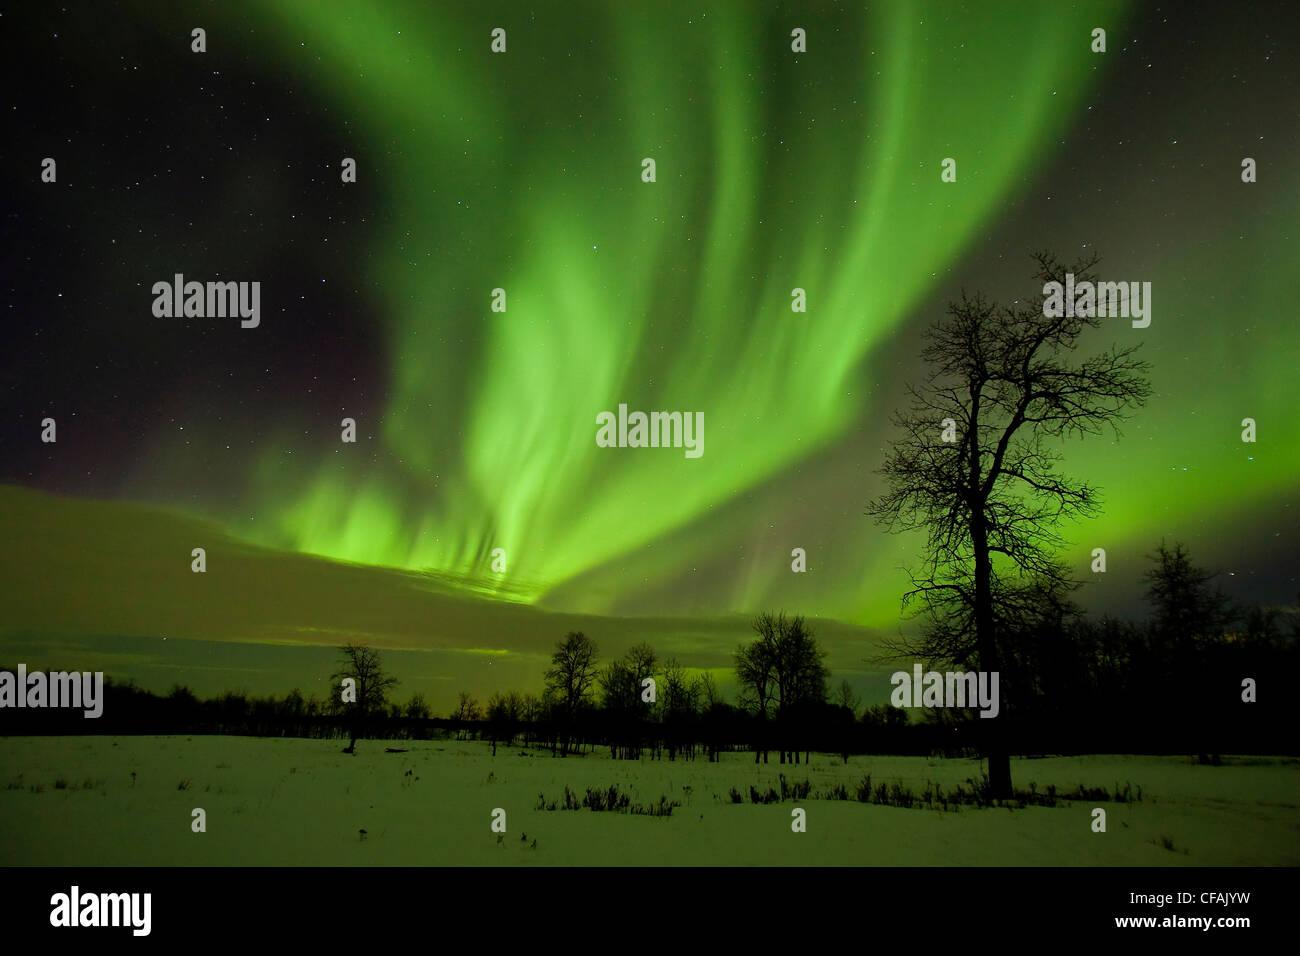 Aurora borealis (northern lights) curtains of light above